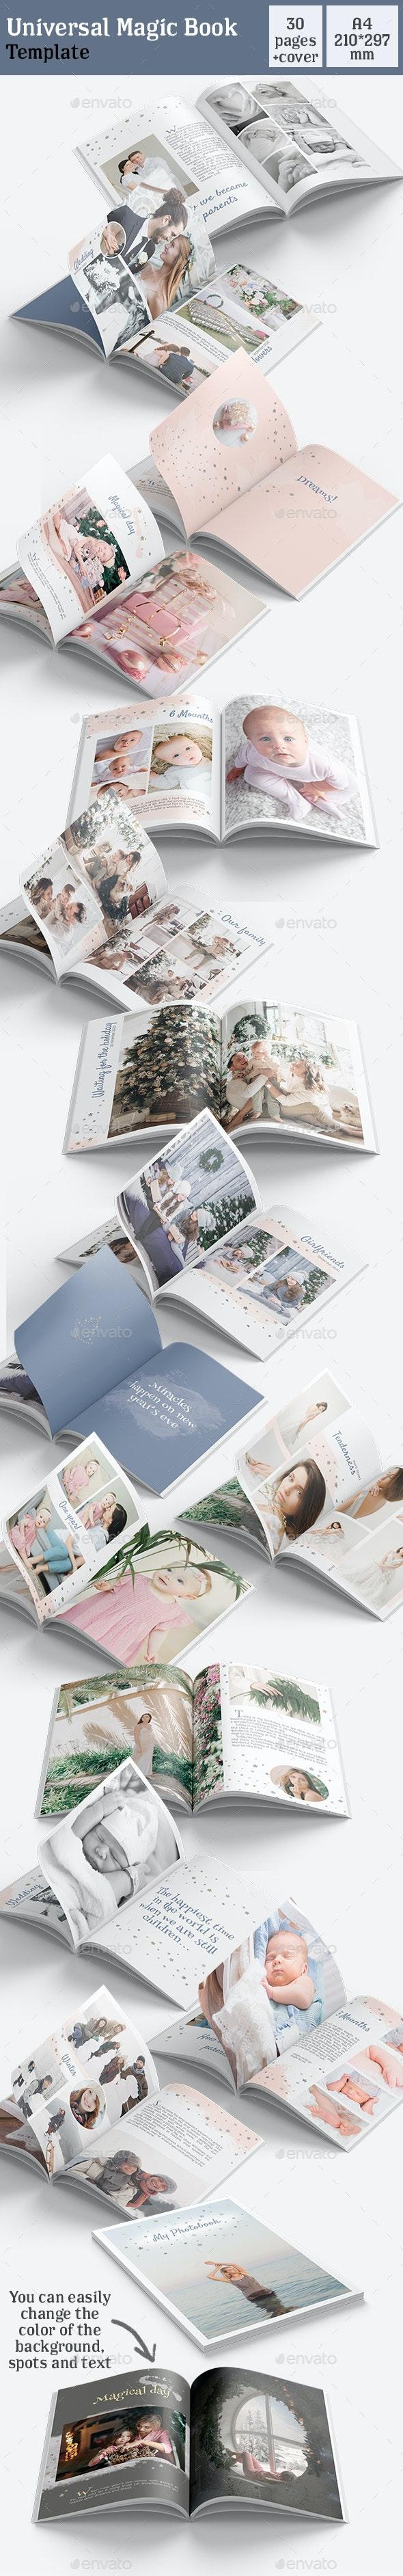 Universal Magic Book Template - Photo Albums Print Templates